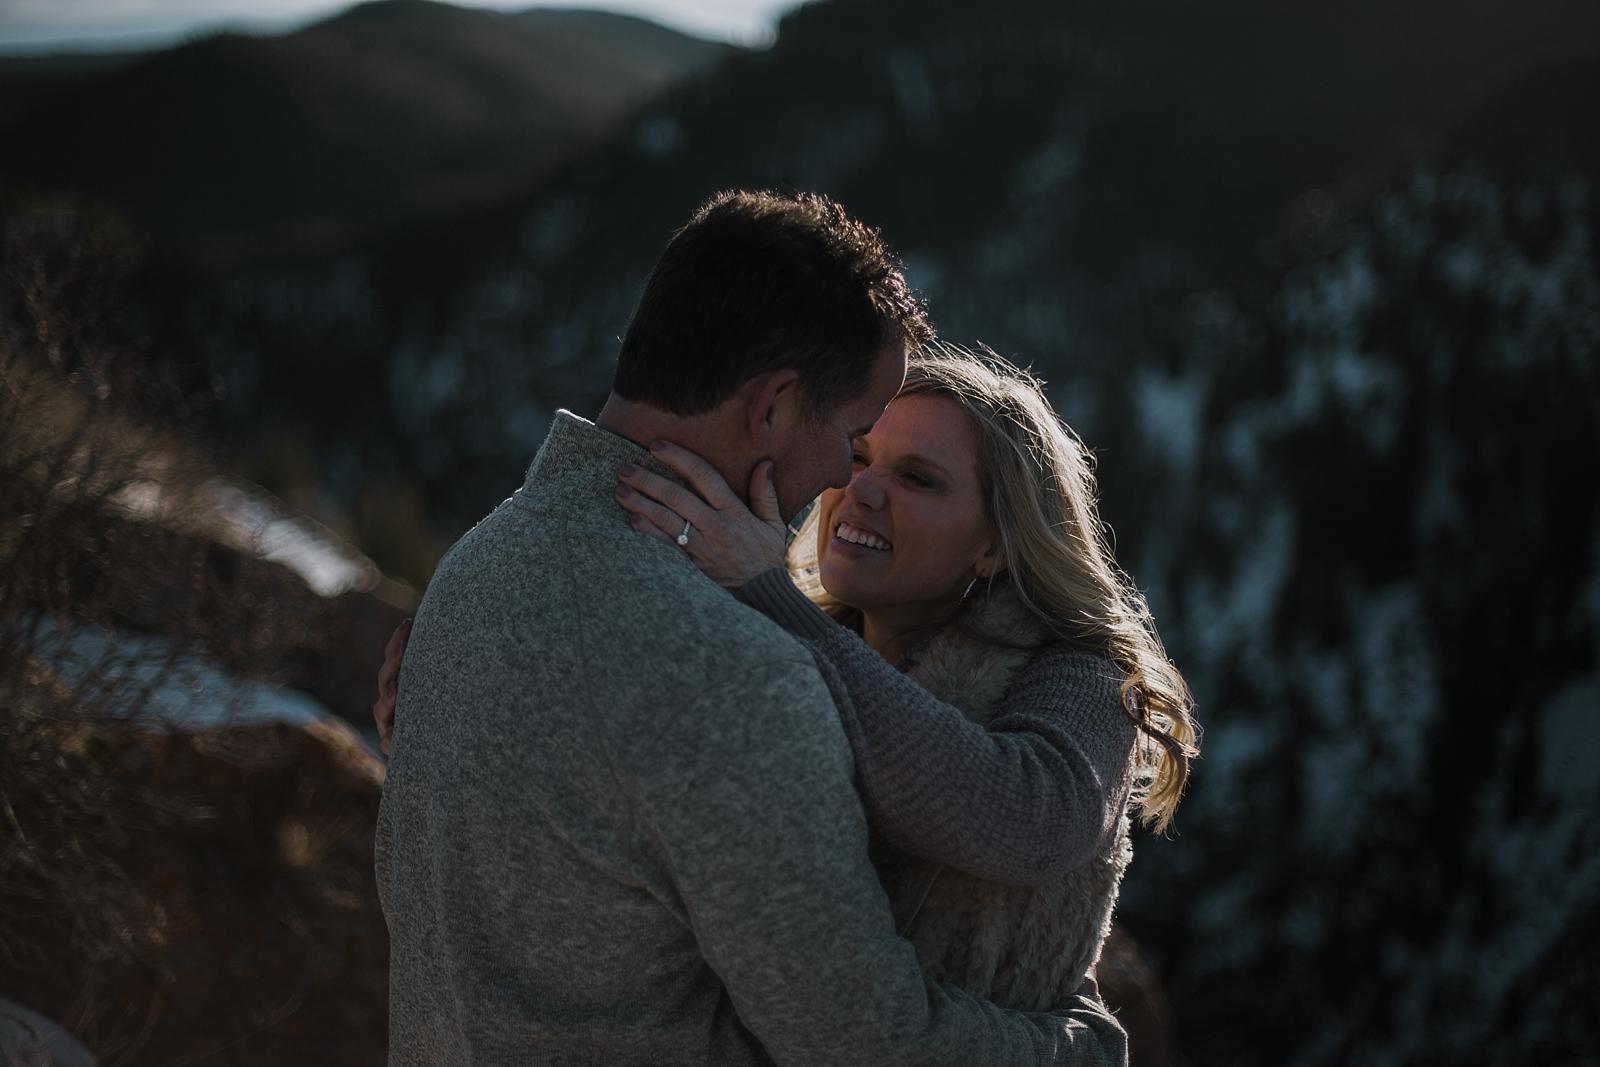 couple on cliffside, hiking photographer, hiking engagements, colorado wedding photographer, leadville wedding photographer, red cliff wedding photographer